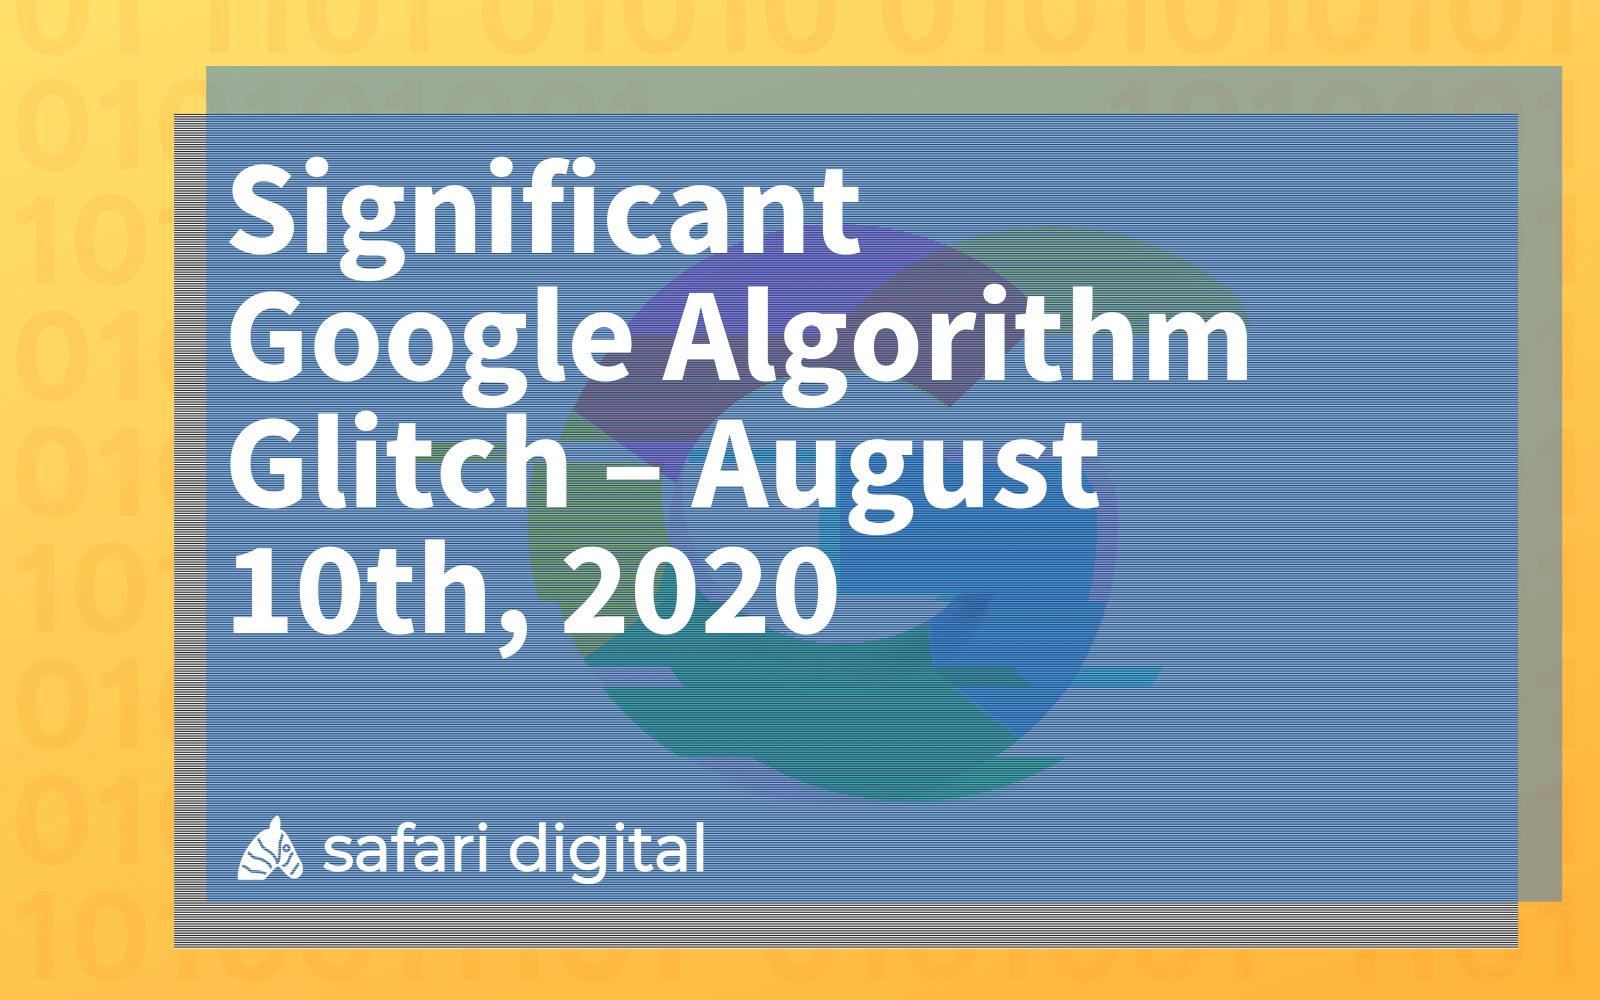 Google Algorithm Glitch August 2020 cover image